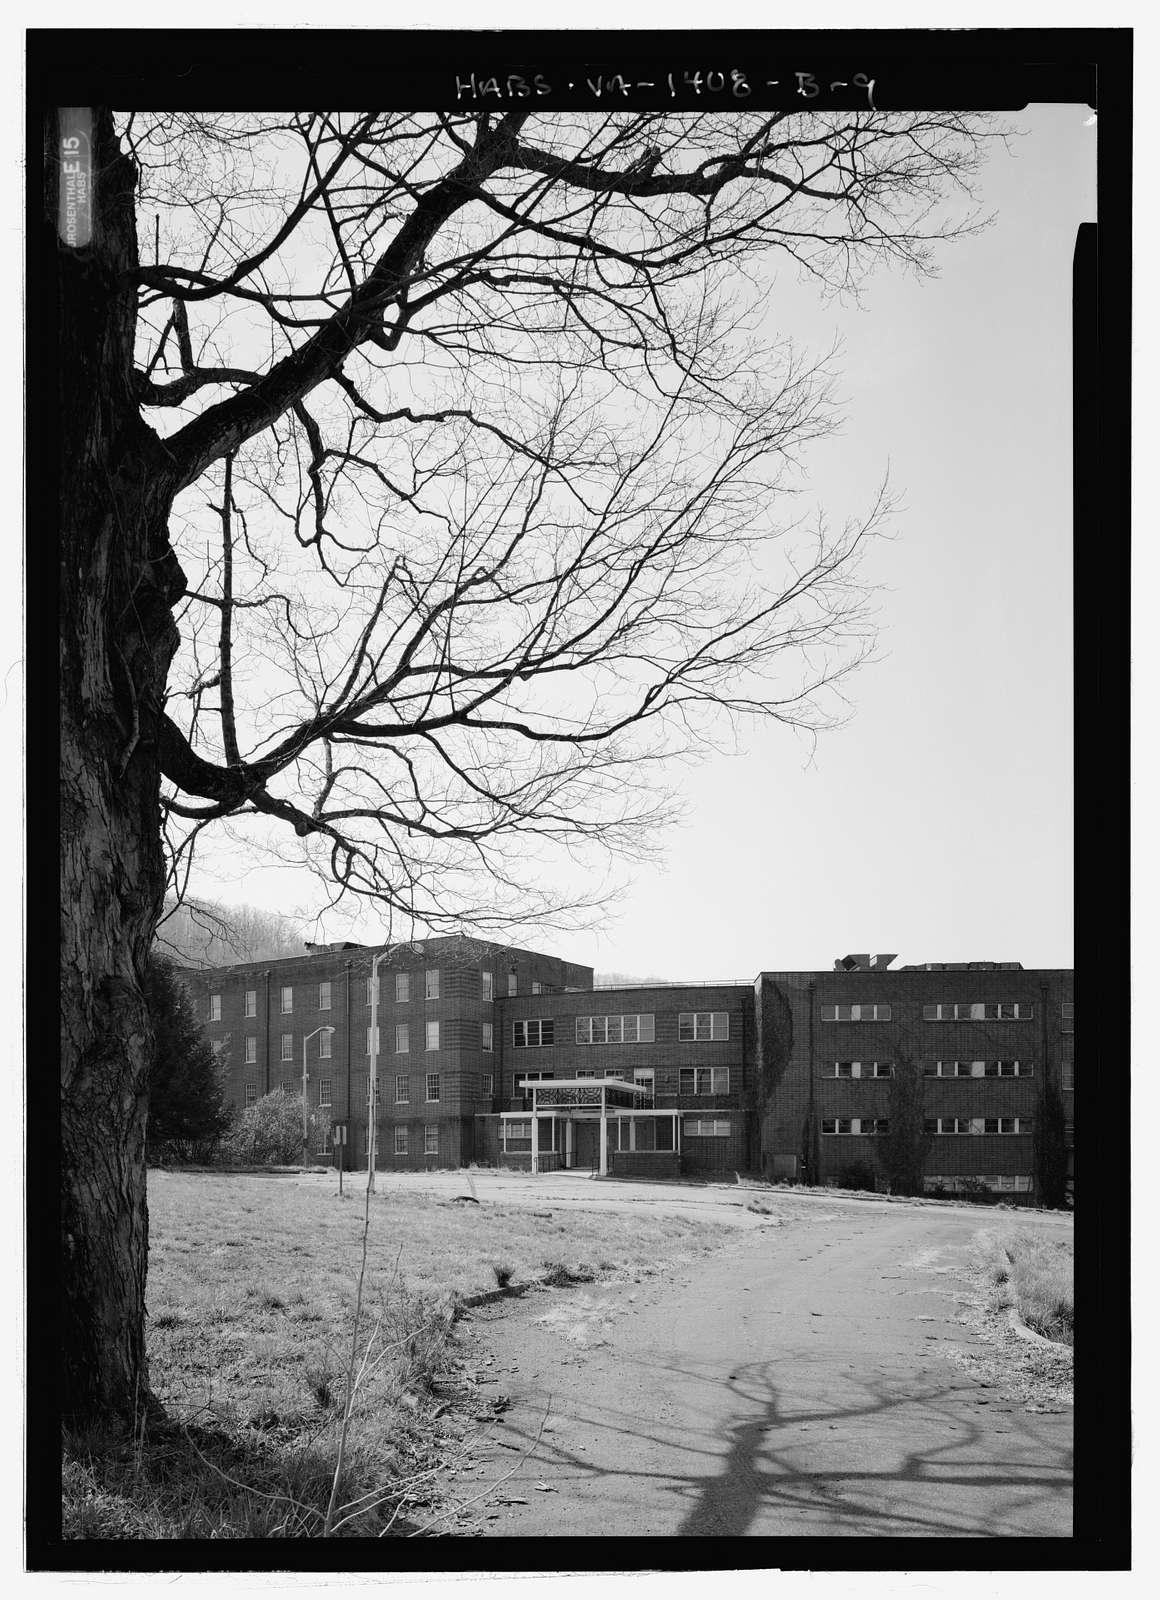 Blue Ridge Sanatorium, Building No. 1902, East side of State Route 20, .25 mile south of I-64, Charlottesville, Charlottesville, VA